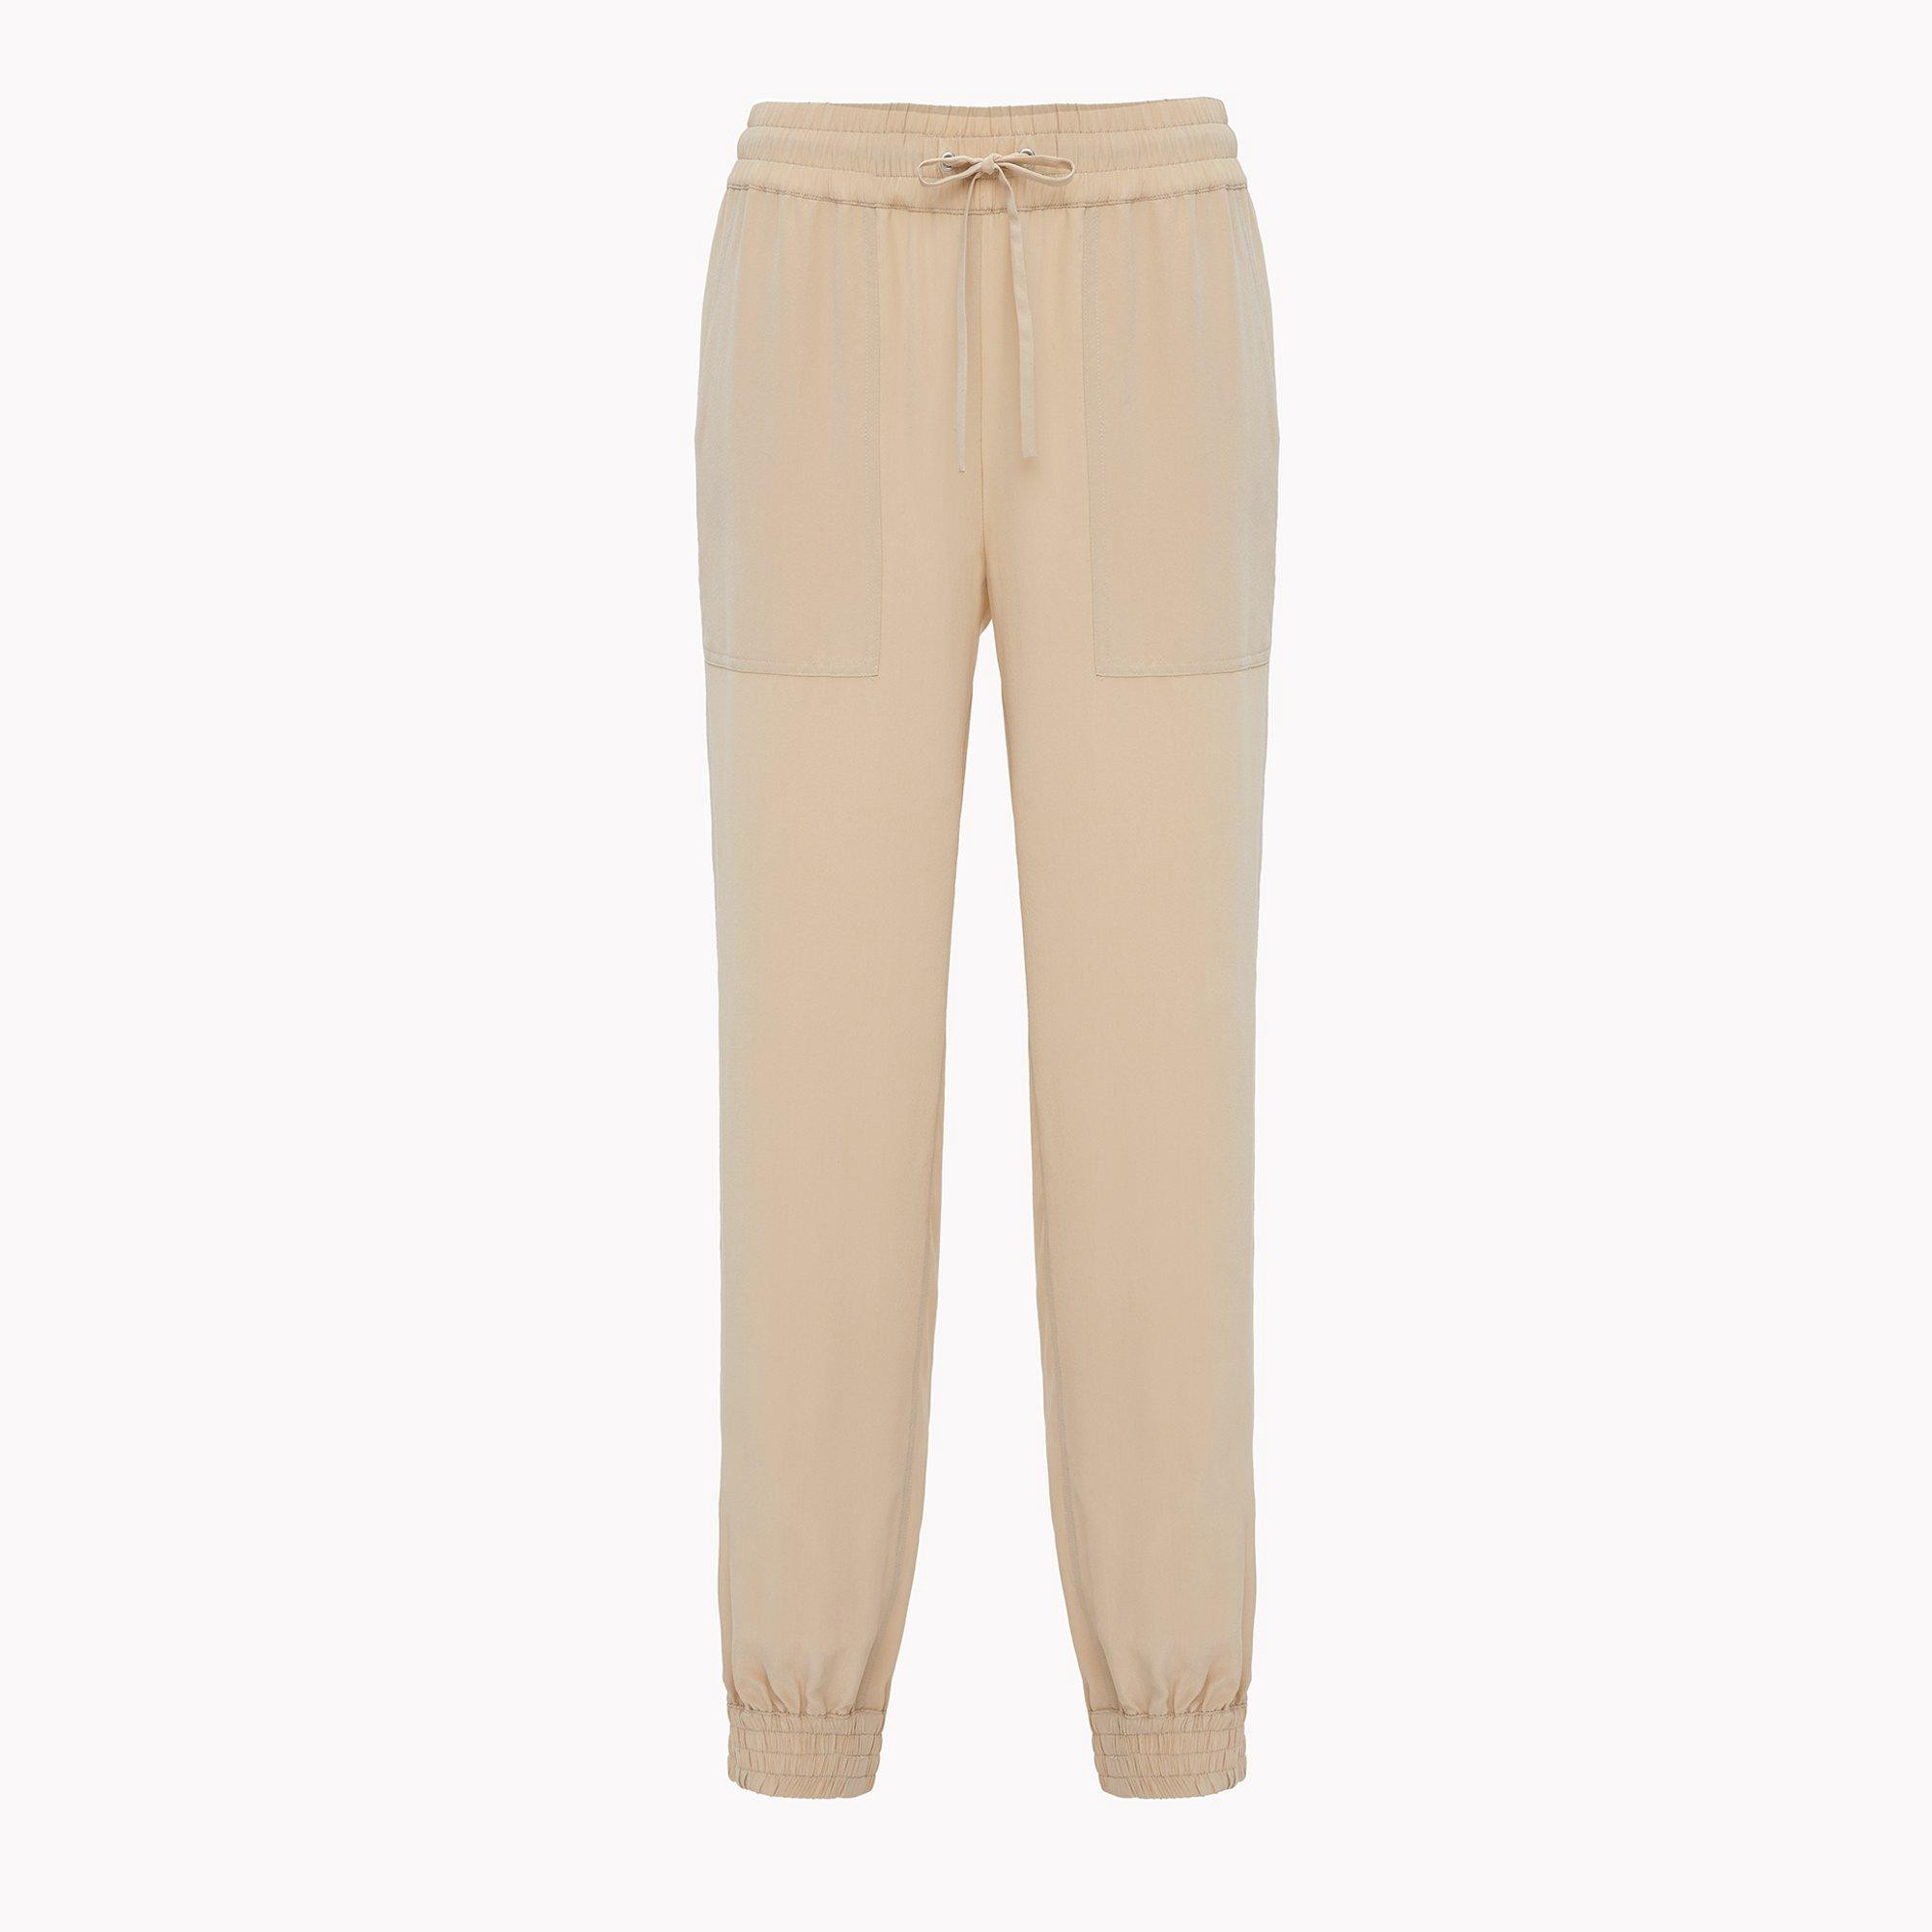 THEORY Silk Utility Pant - Light Barley